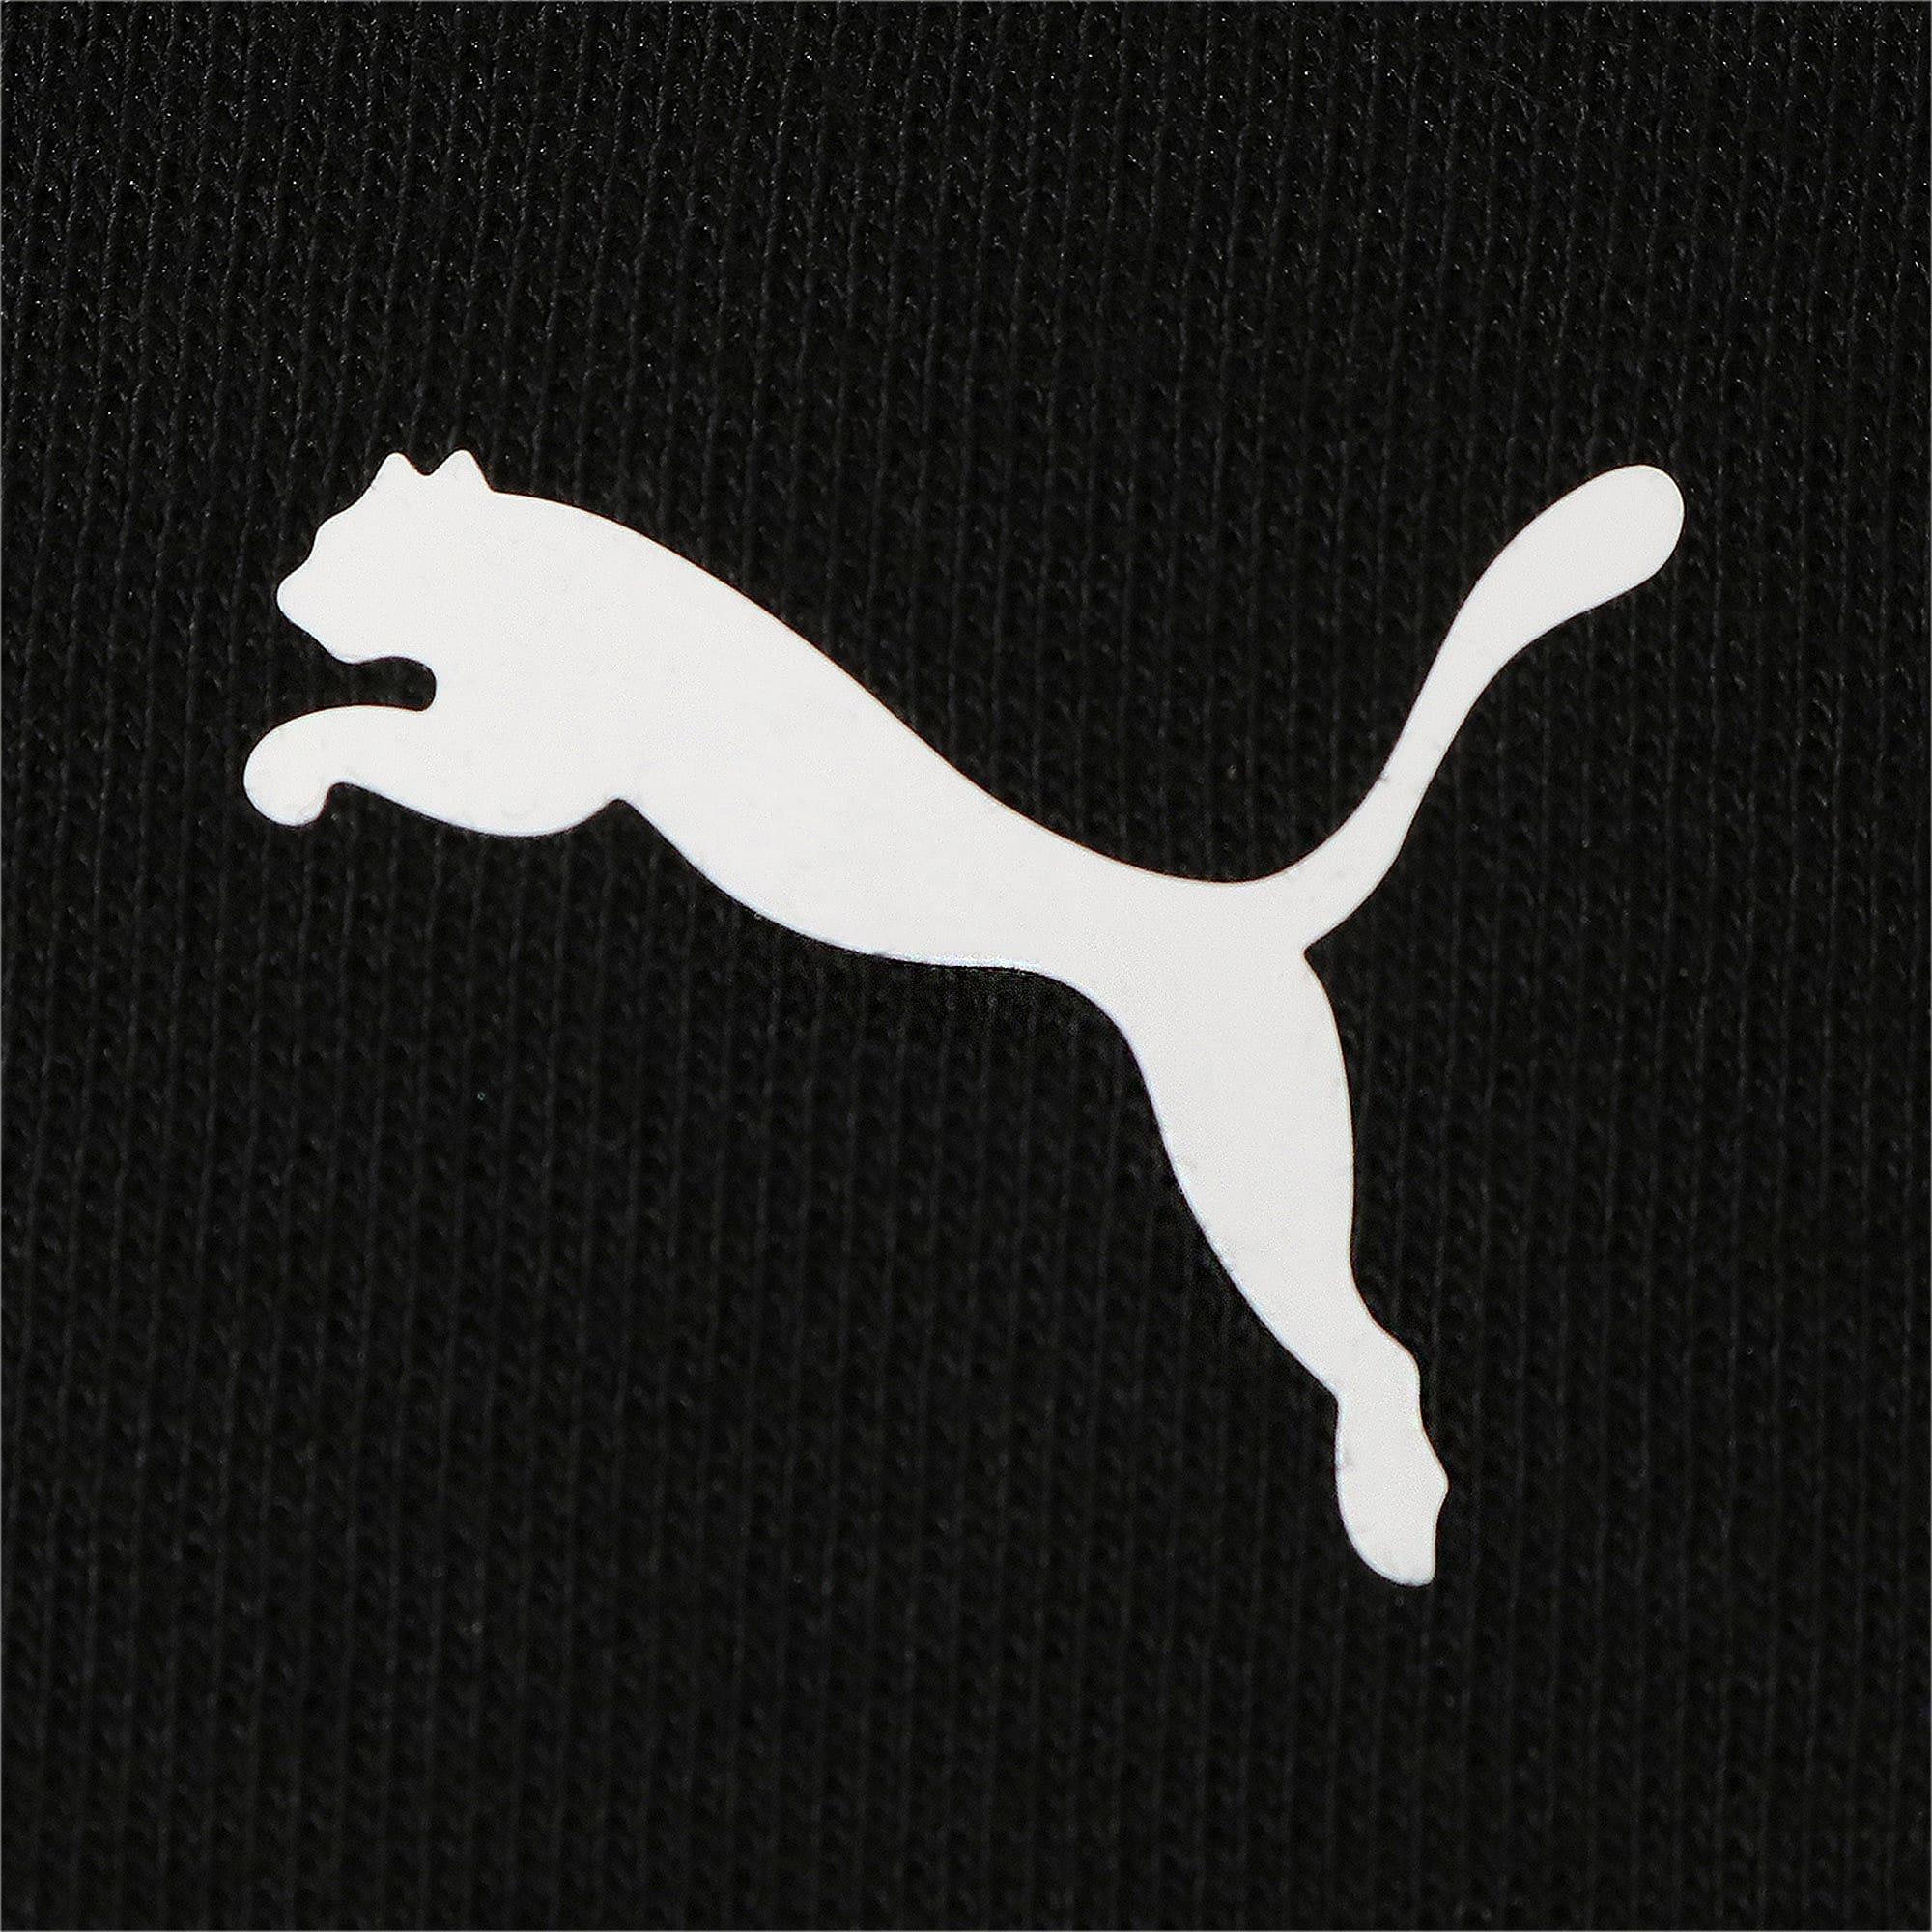 Thumbnail 7 of フィール イット ウィメンズ トレーニング スウェットジャケット, Puma Black, medium-JPN